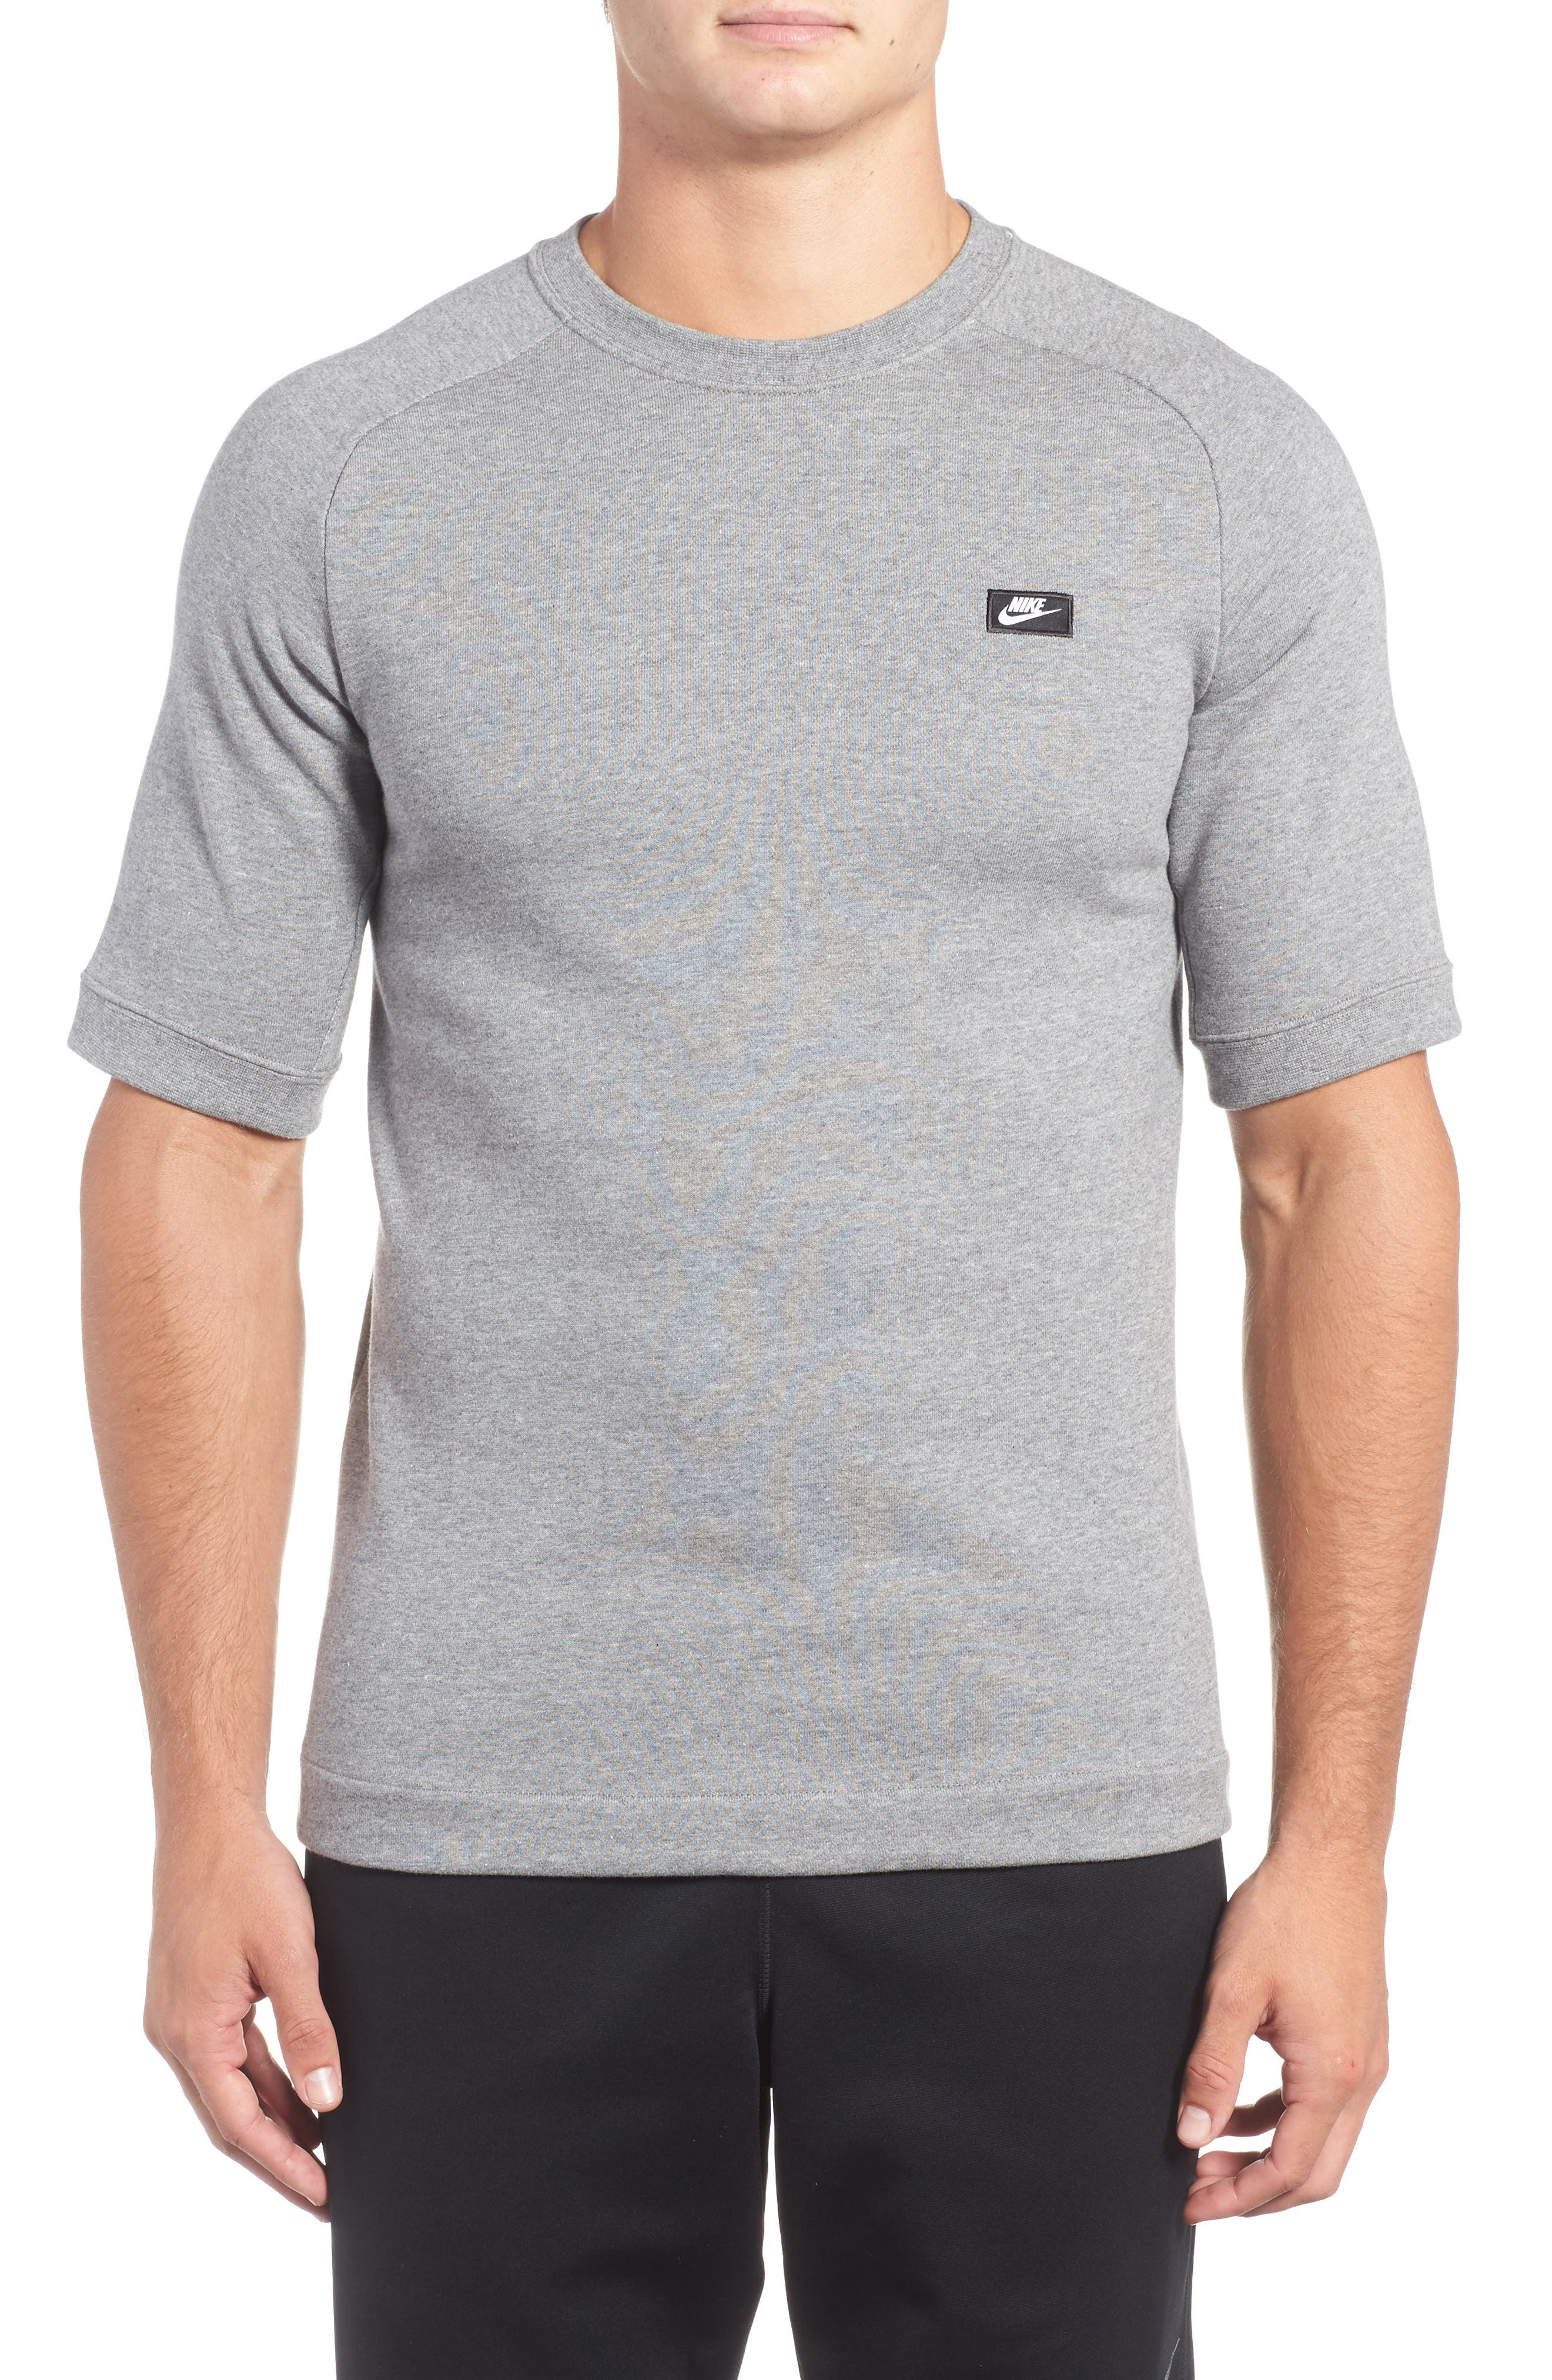 NIKE Sportswear Modern Crew T-Shirt